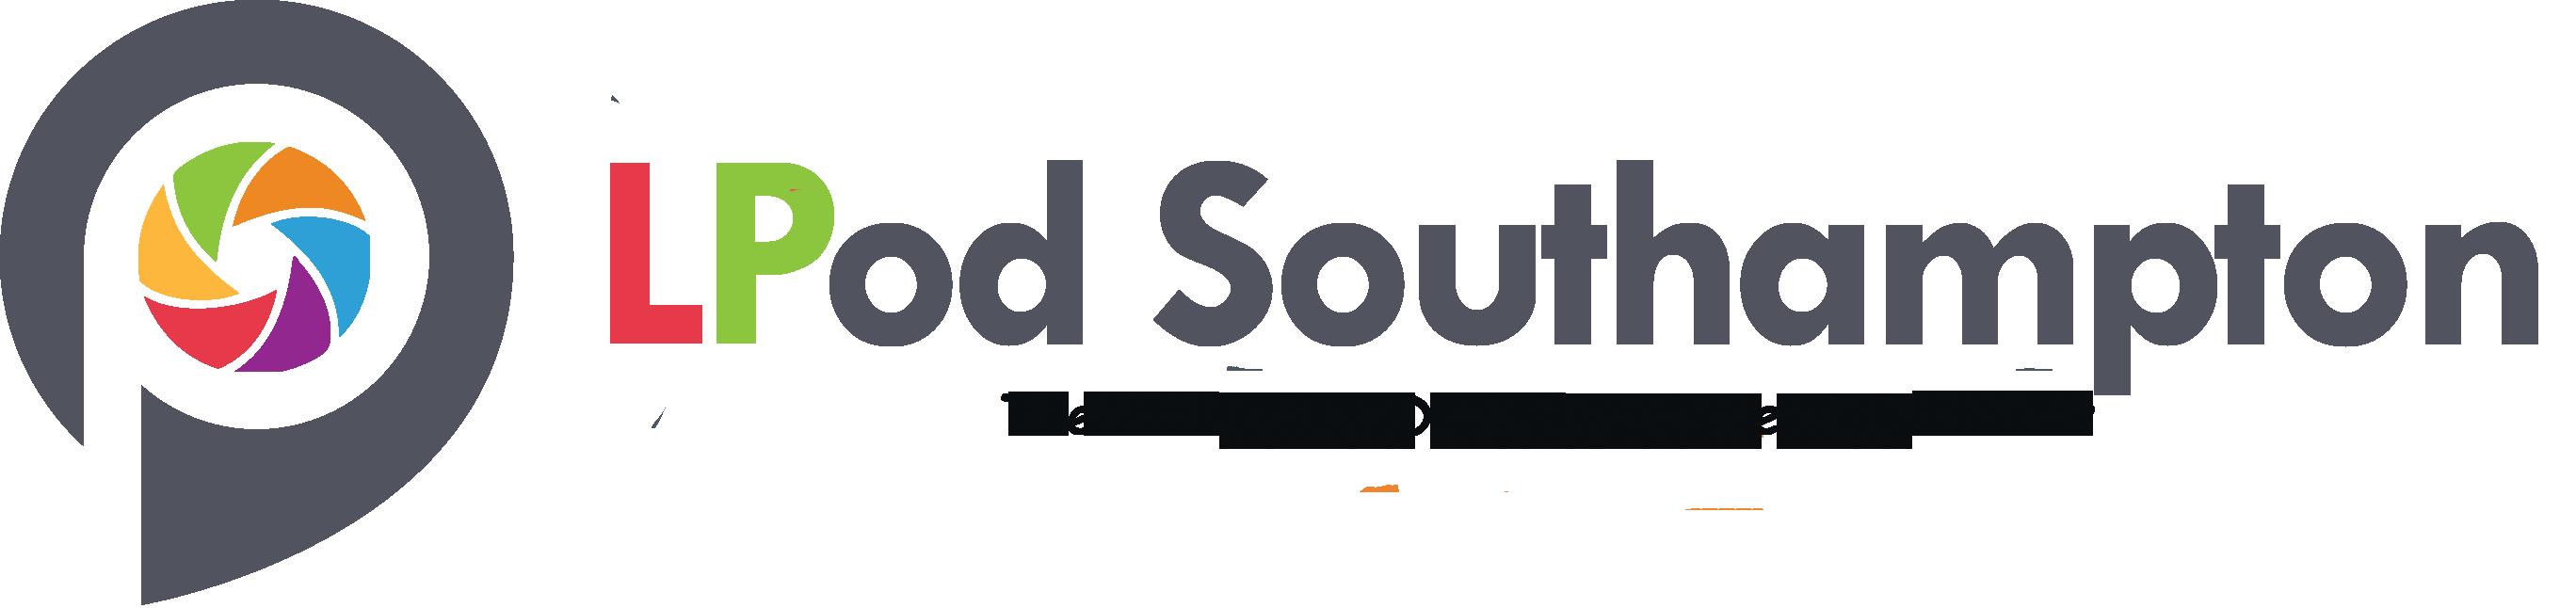 intensive driving courses southampton, intensive driving lessons southampton, intensive driving school southampton